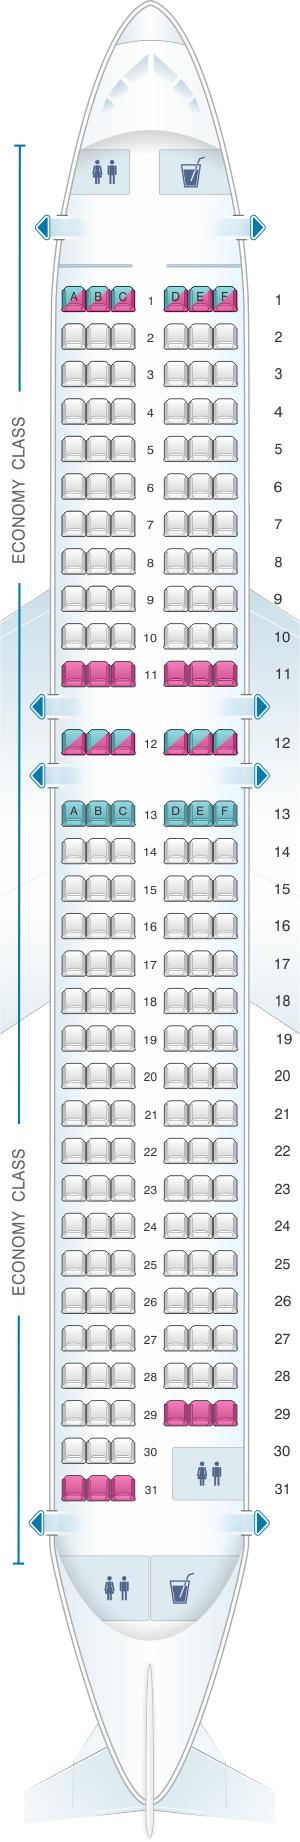 plan de cabine easyjet airbus a320. Black Bedroom Furniture Sets. Home Design Ideas